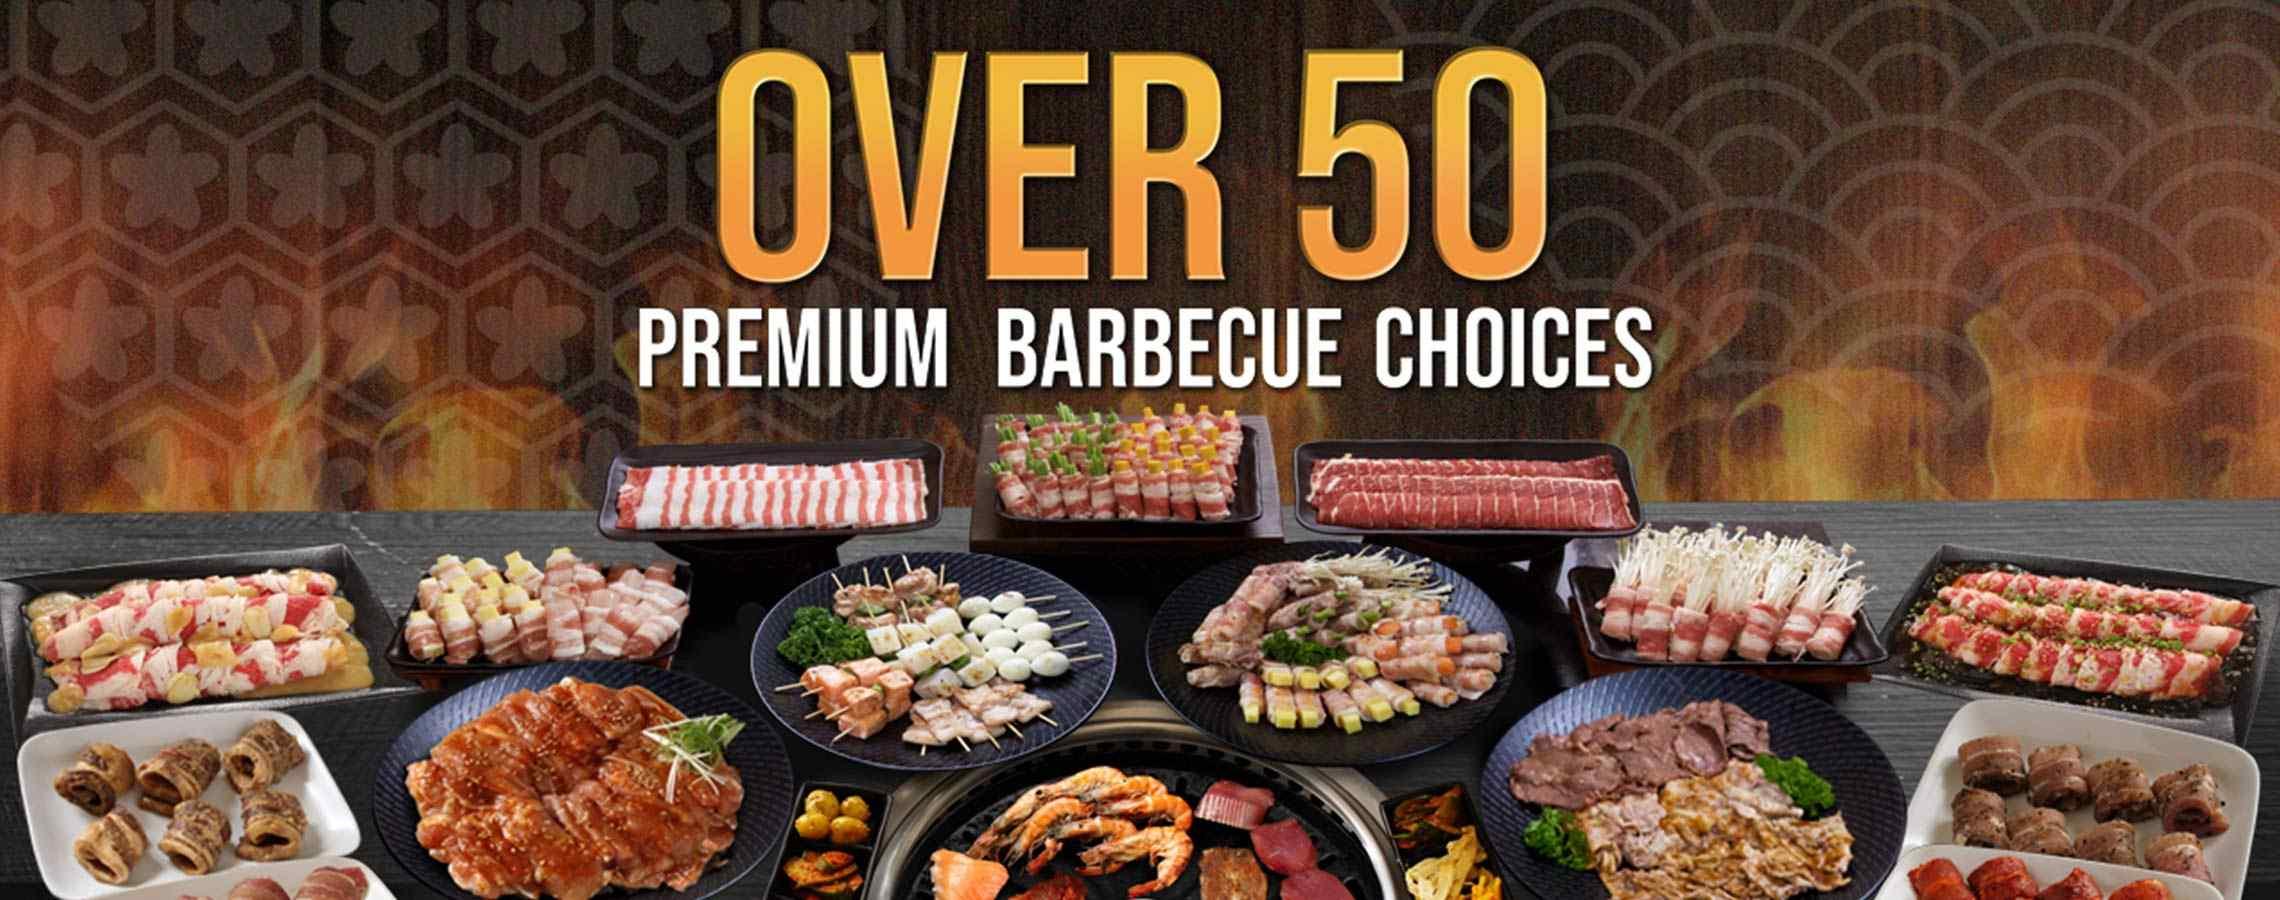 Over 50 Premium Barbecue Choices